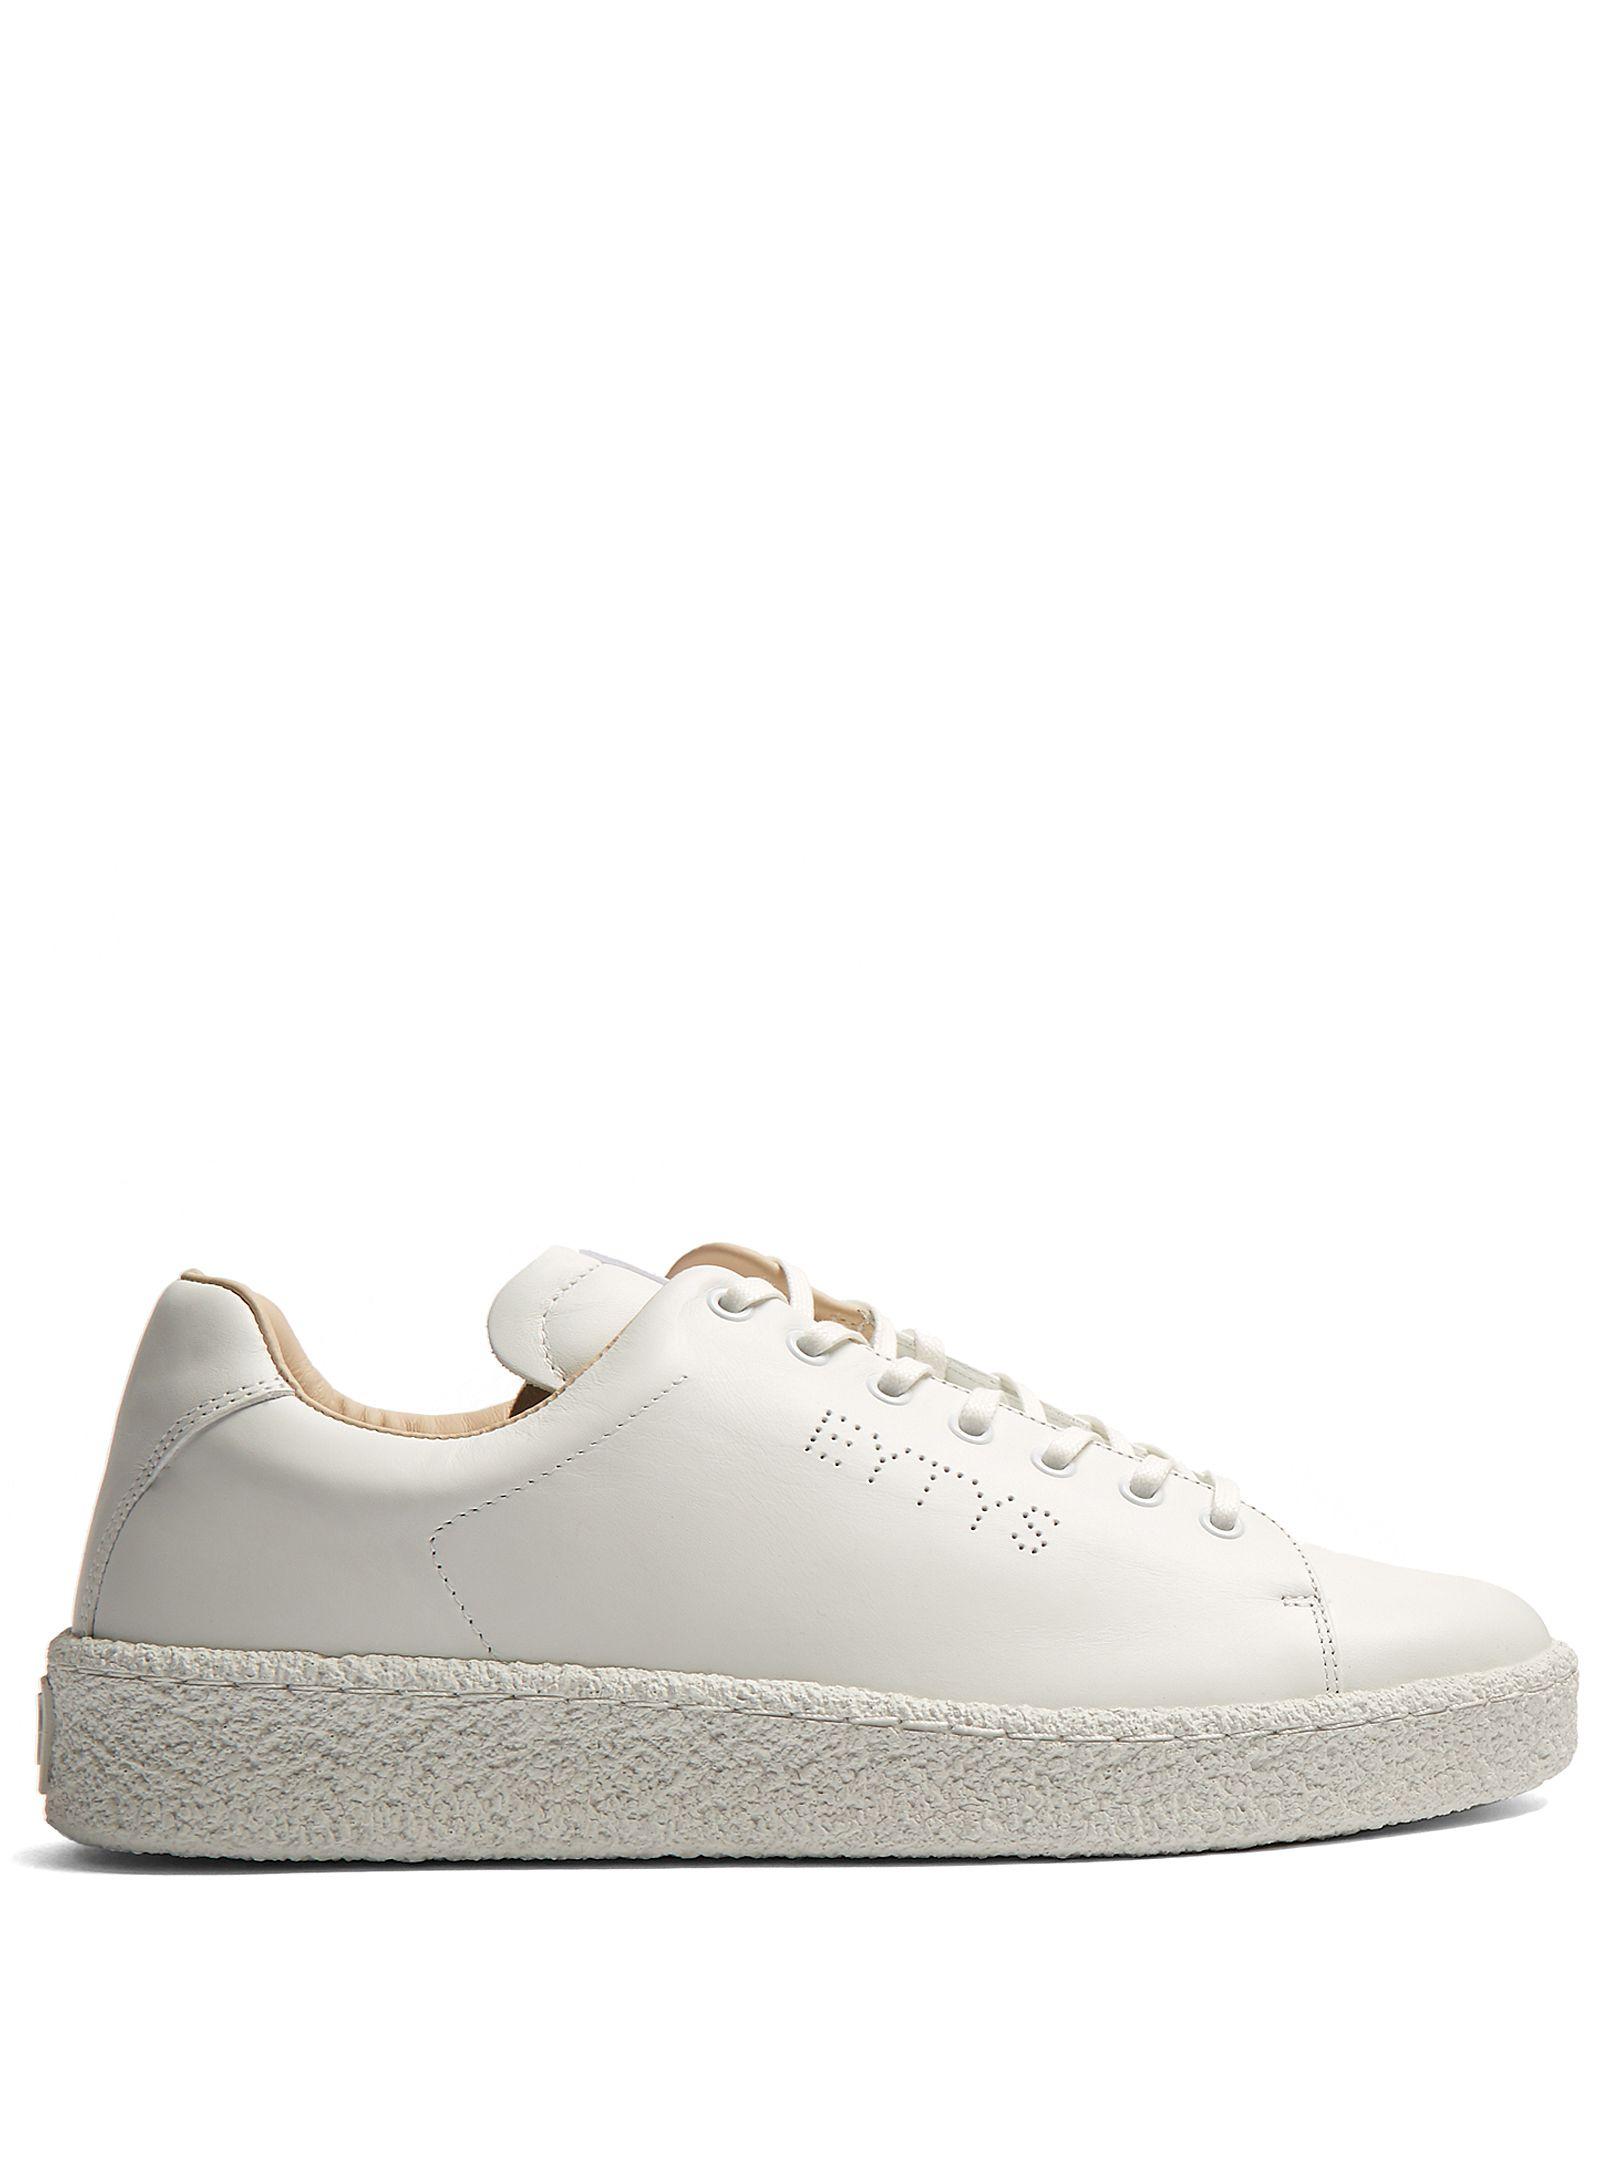 Ace Low-Top Sneakers Eytys 0vjZn0hzA